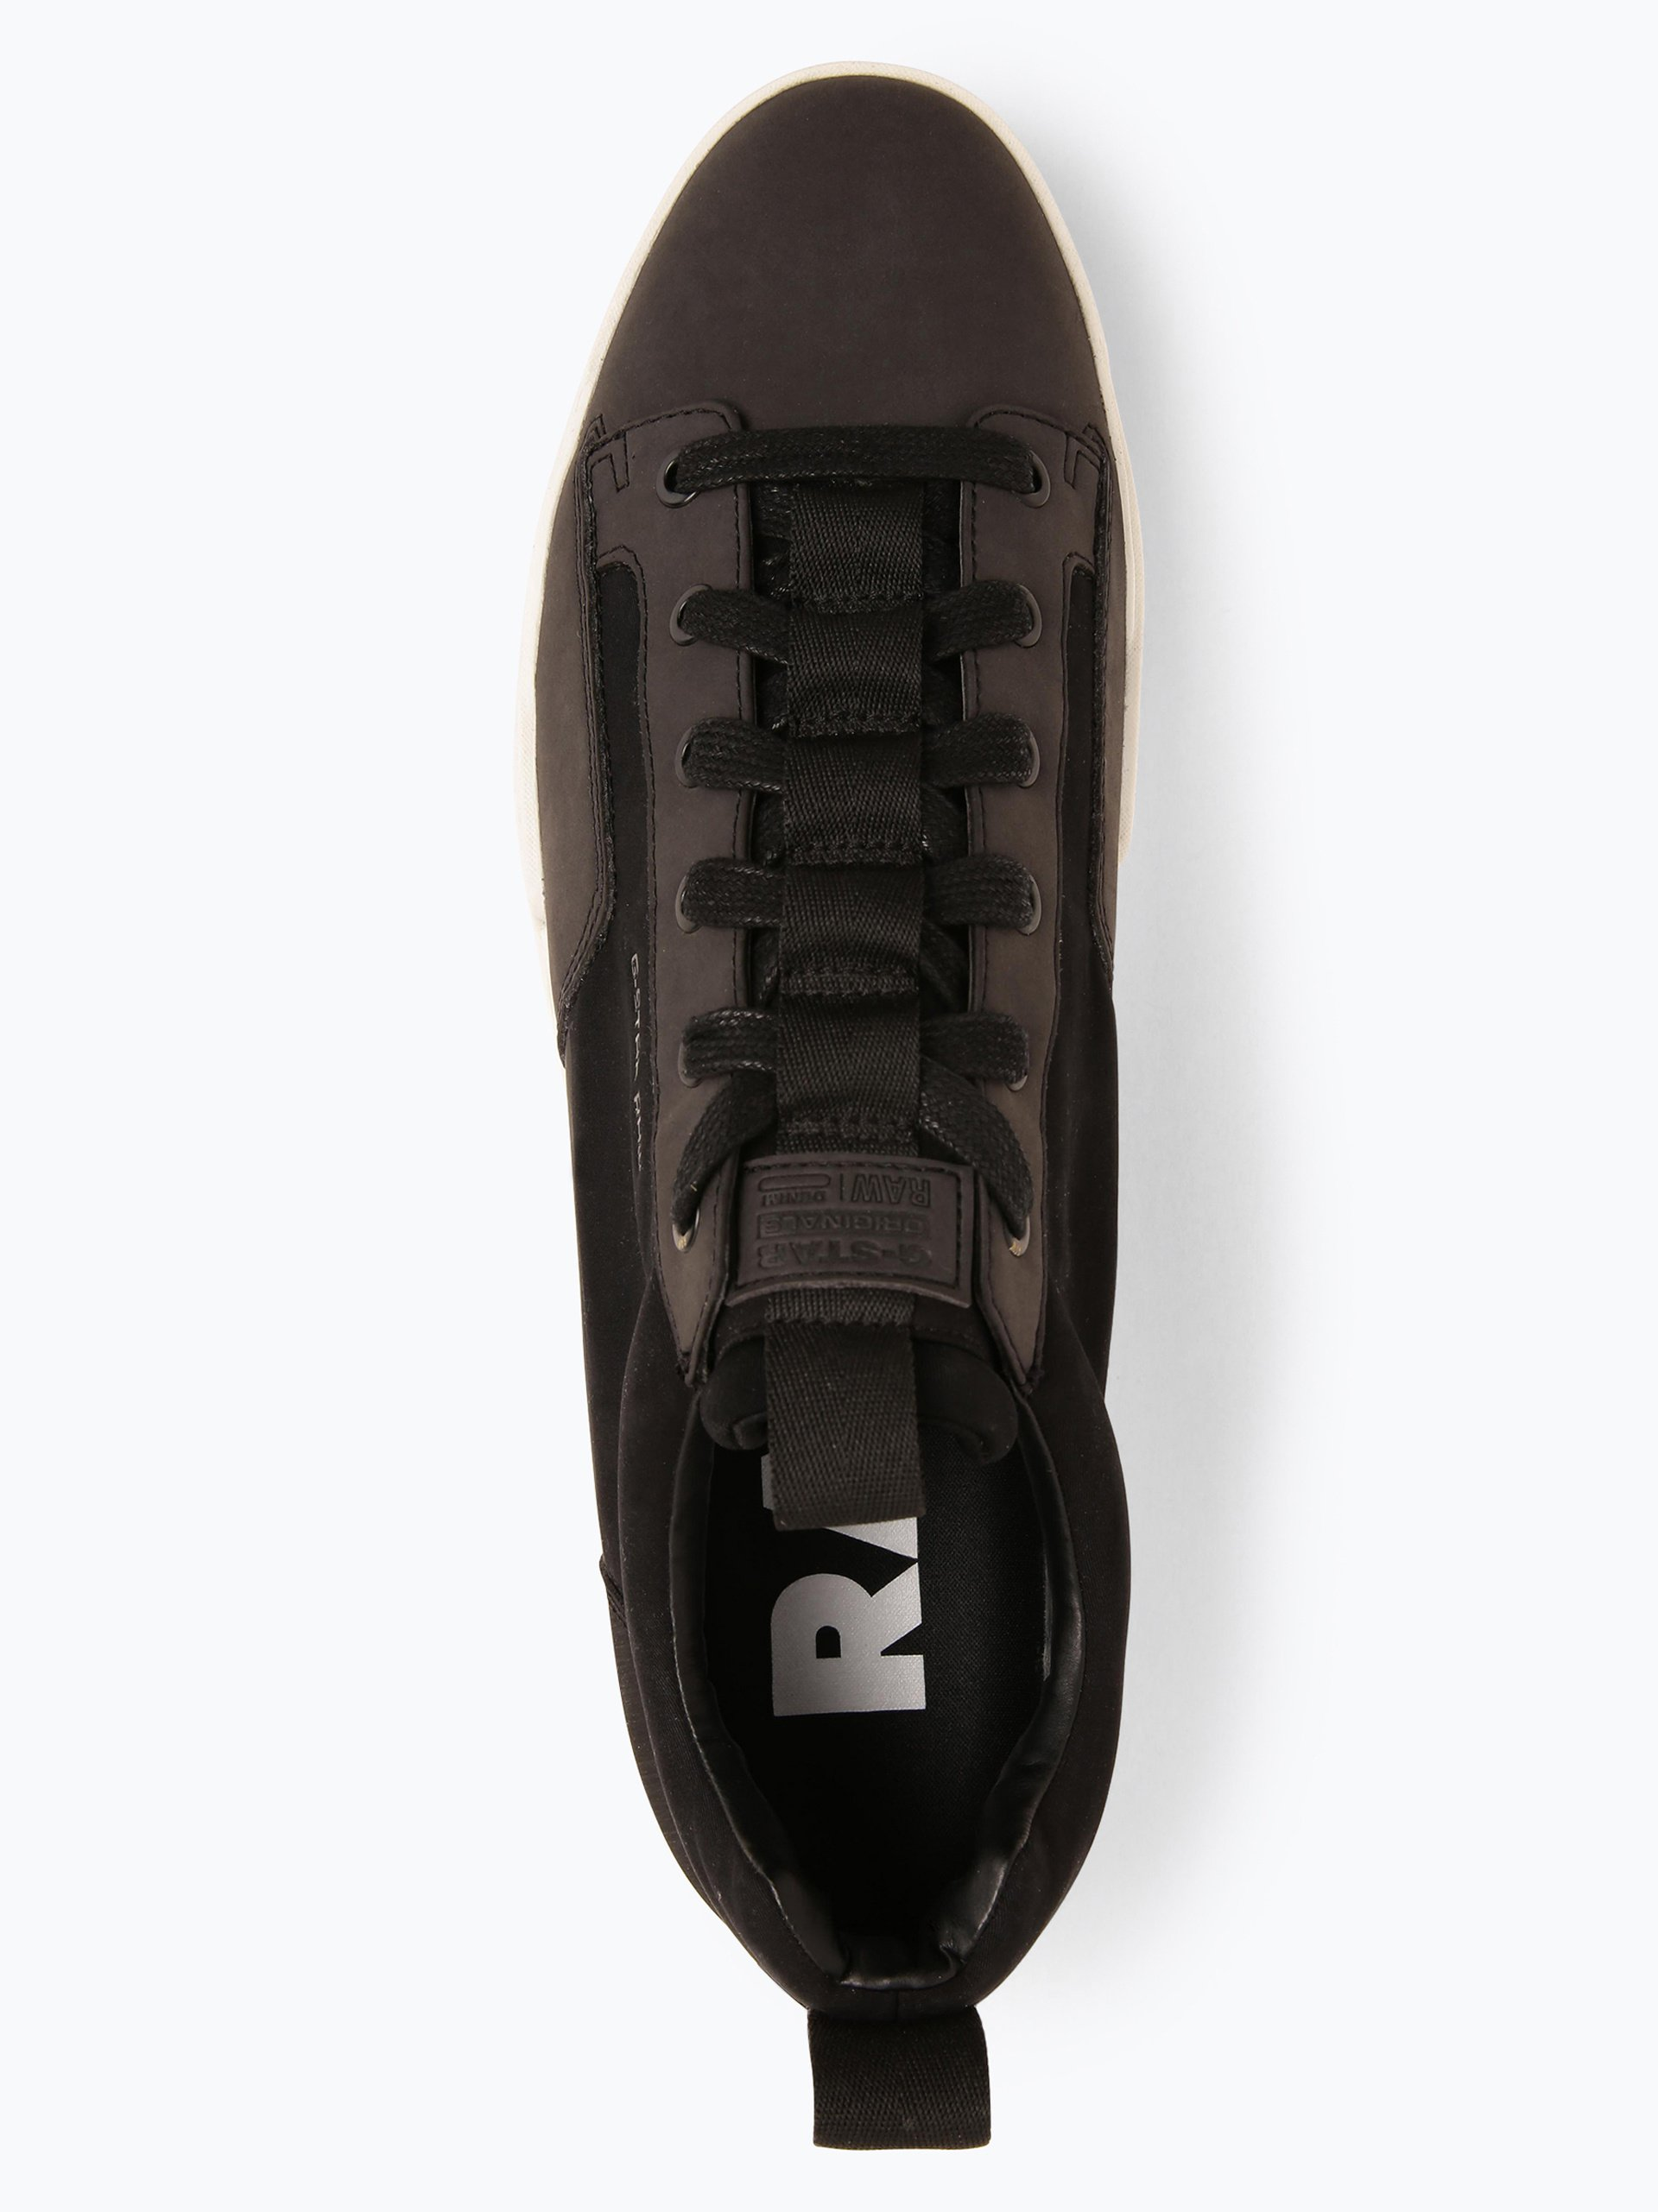 G-Star RAW Herren Sneaker - Rackam